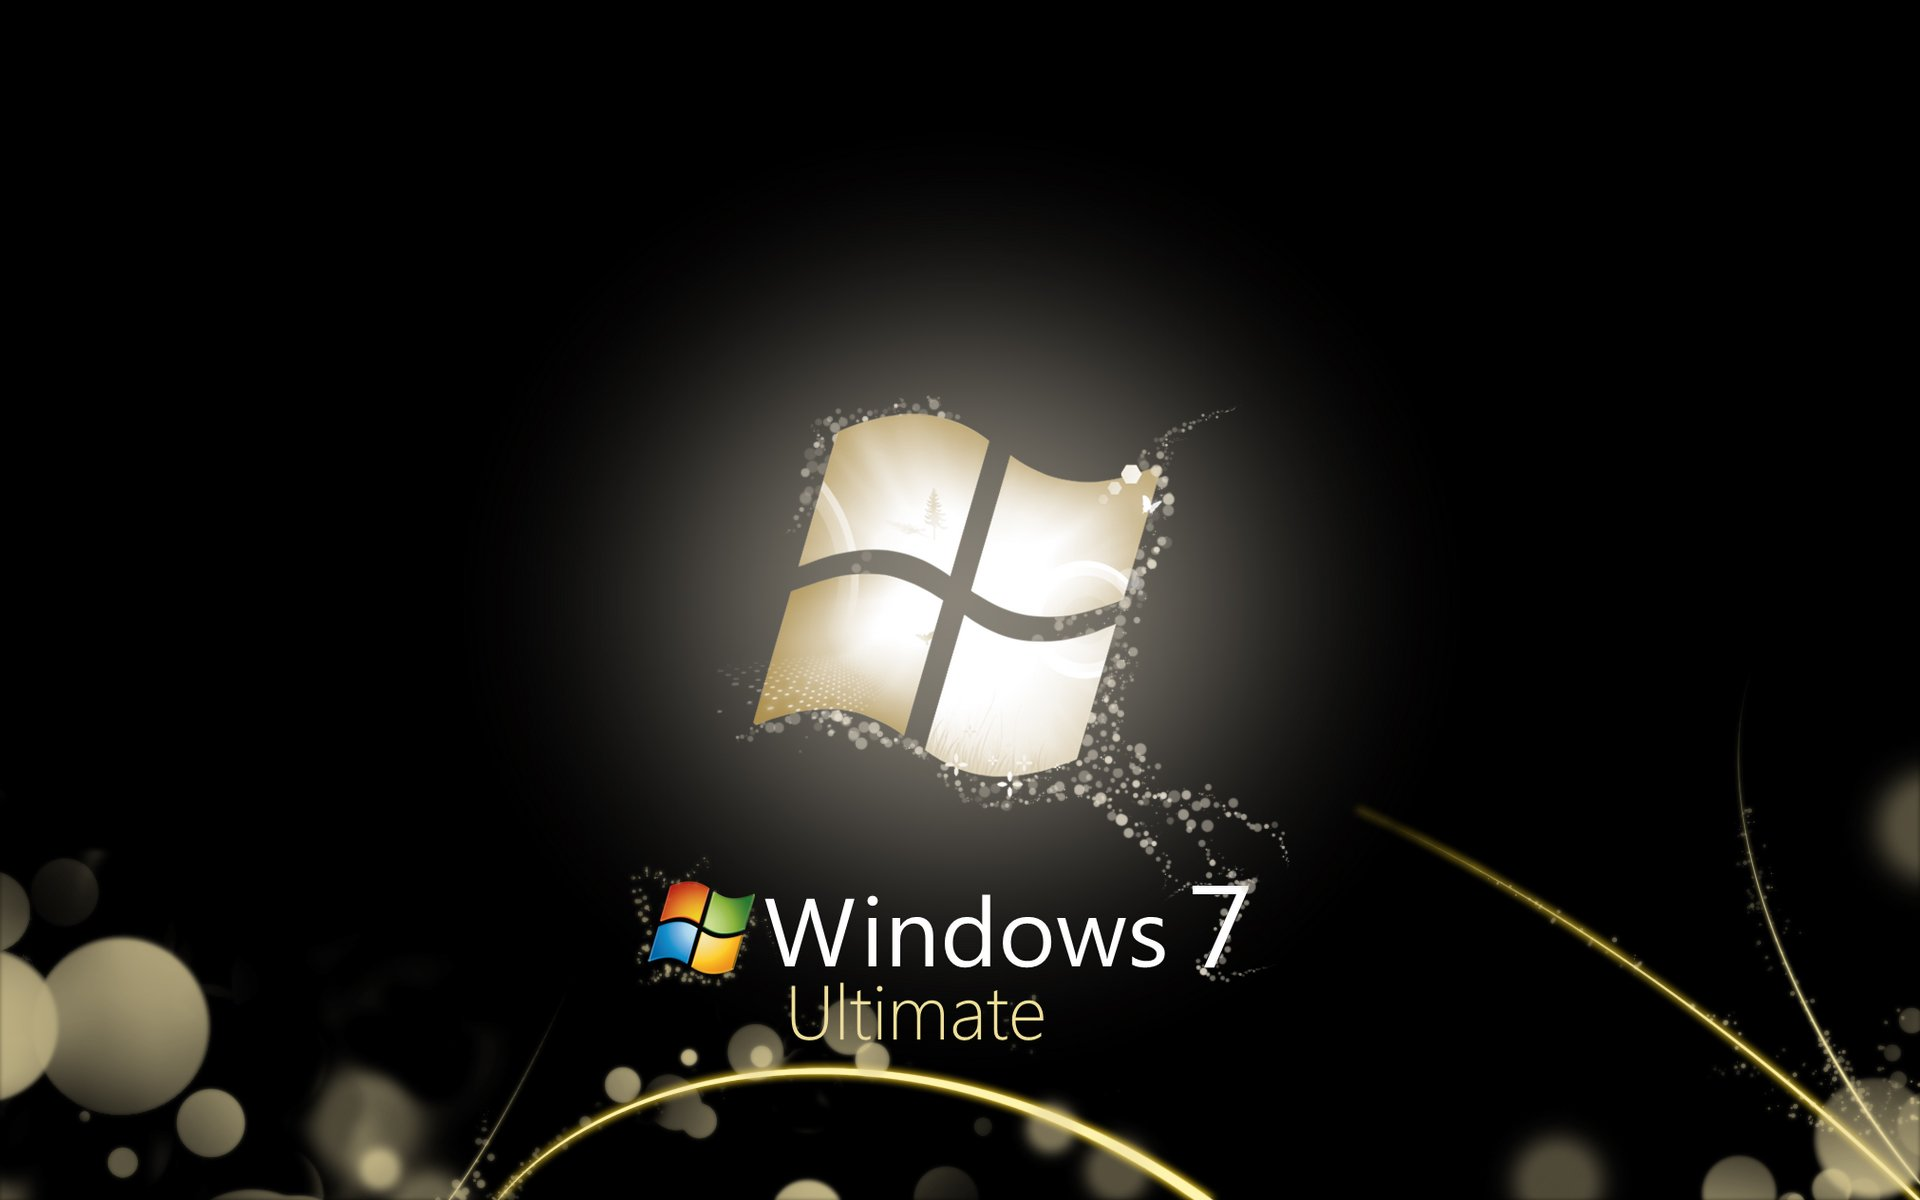 wallpaper windows windows7 1920x1200 1920x1200